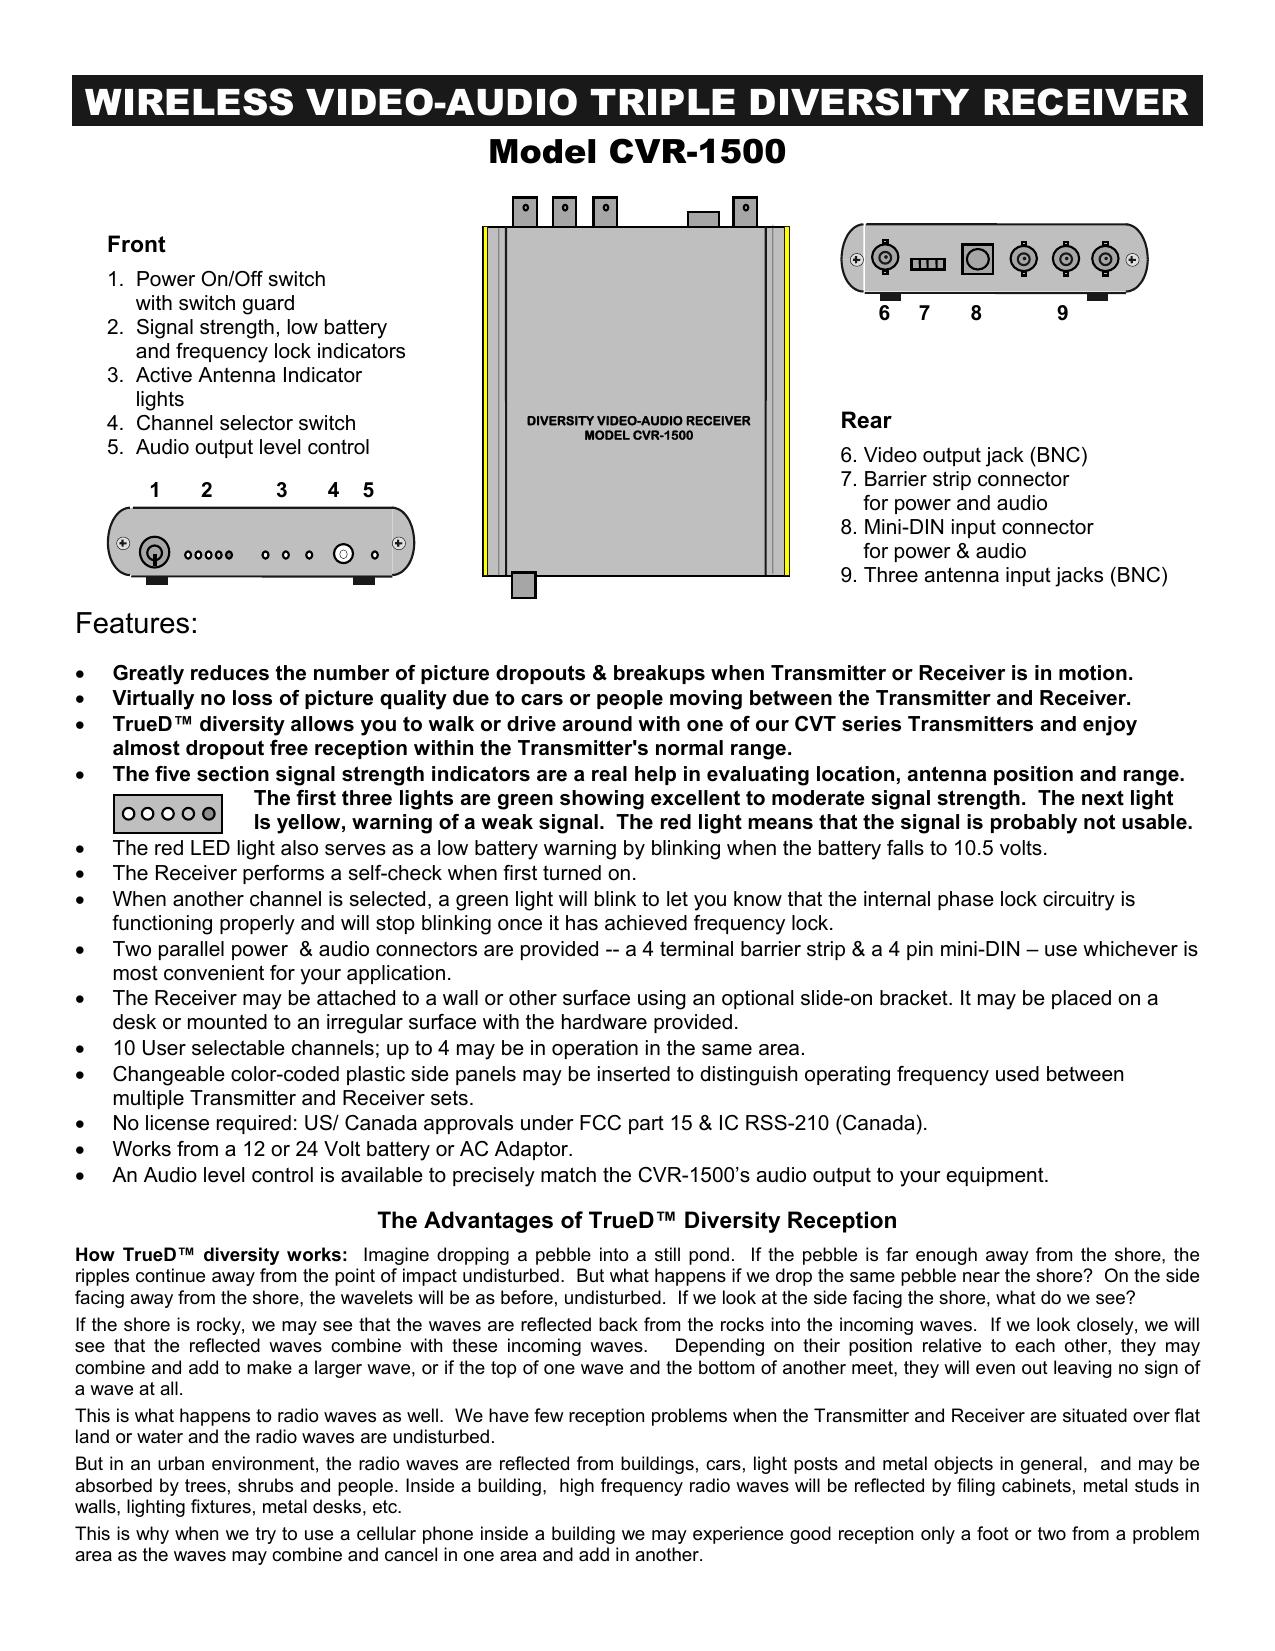 CVR-1500 Video/Audio Diversity Receiver